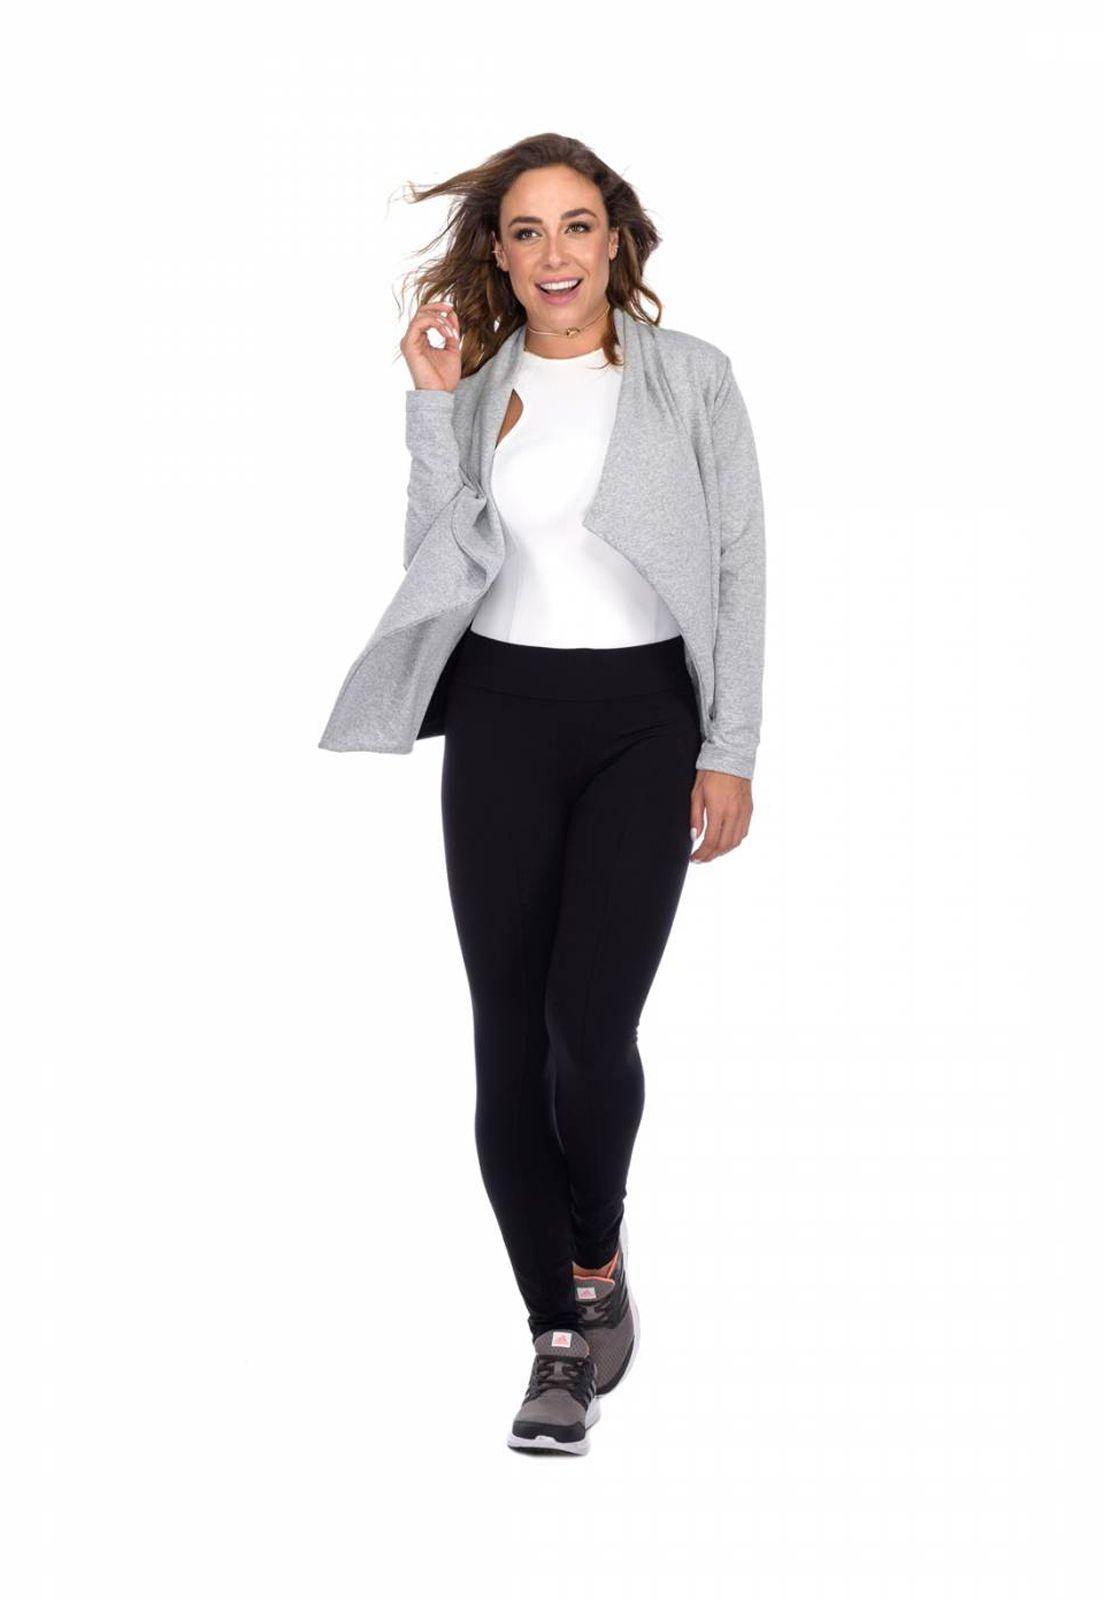 Cardigan Flavia Donadio Beachwear com recorte na lateral cinza claro